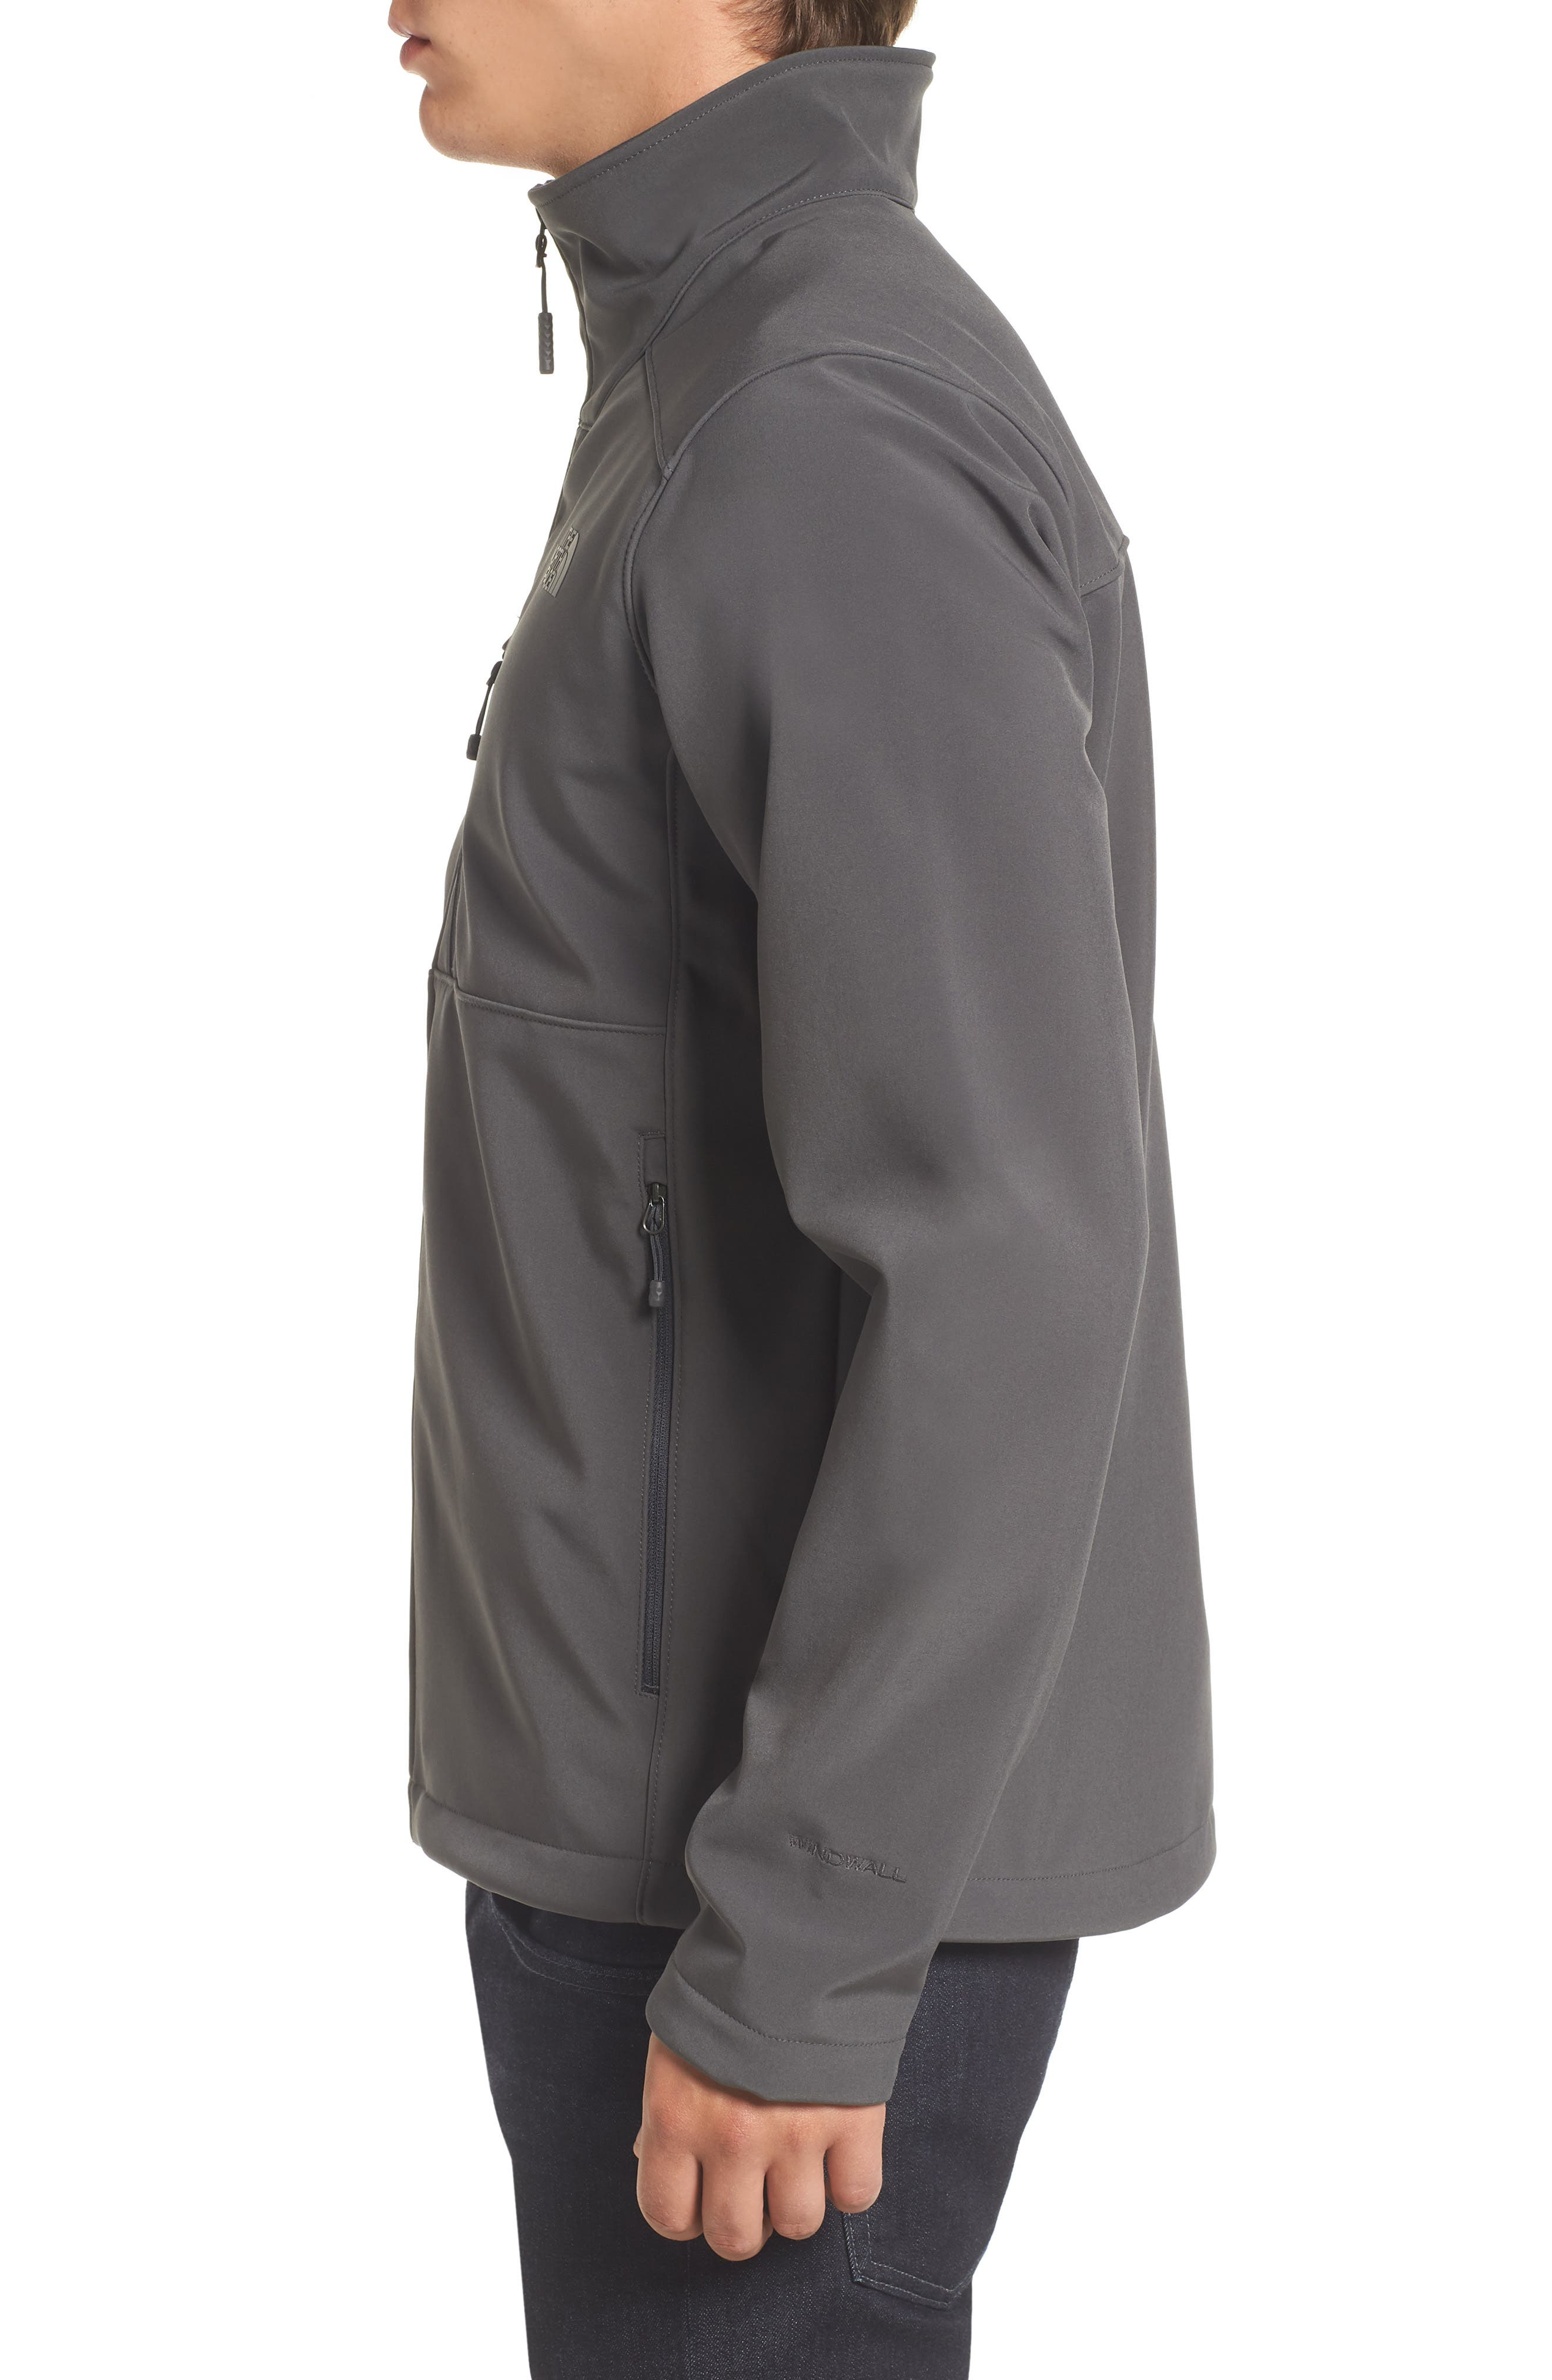 'Apex Bionic 2' Windproof & Water Resistant Soft Shell Jacket,                             Alternate thumbnail 3, color,                             ASPHALT GREY/ASPHALT GREY